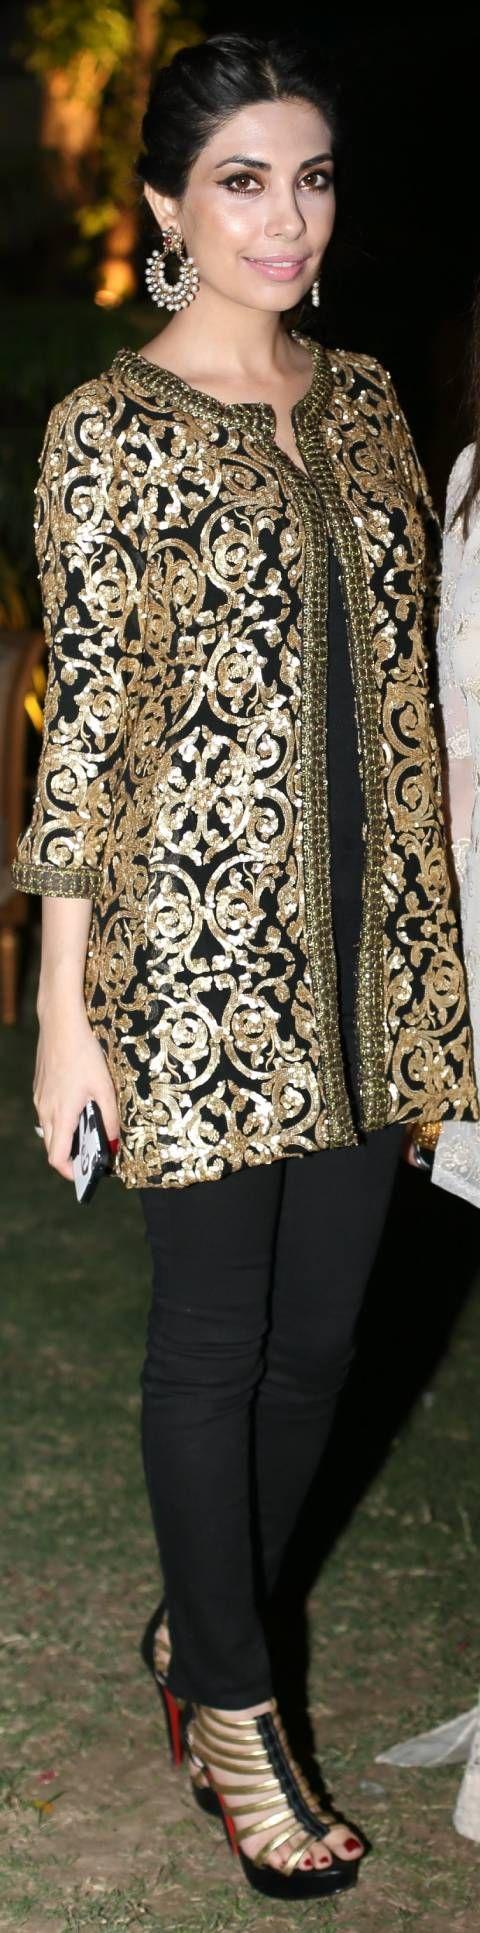 Pakistani outfit.. gold Sana Safinaz ensemble | Desi | Pinterest ...